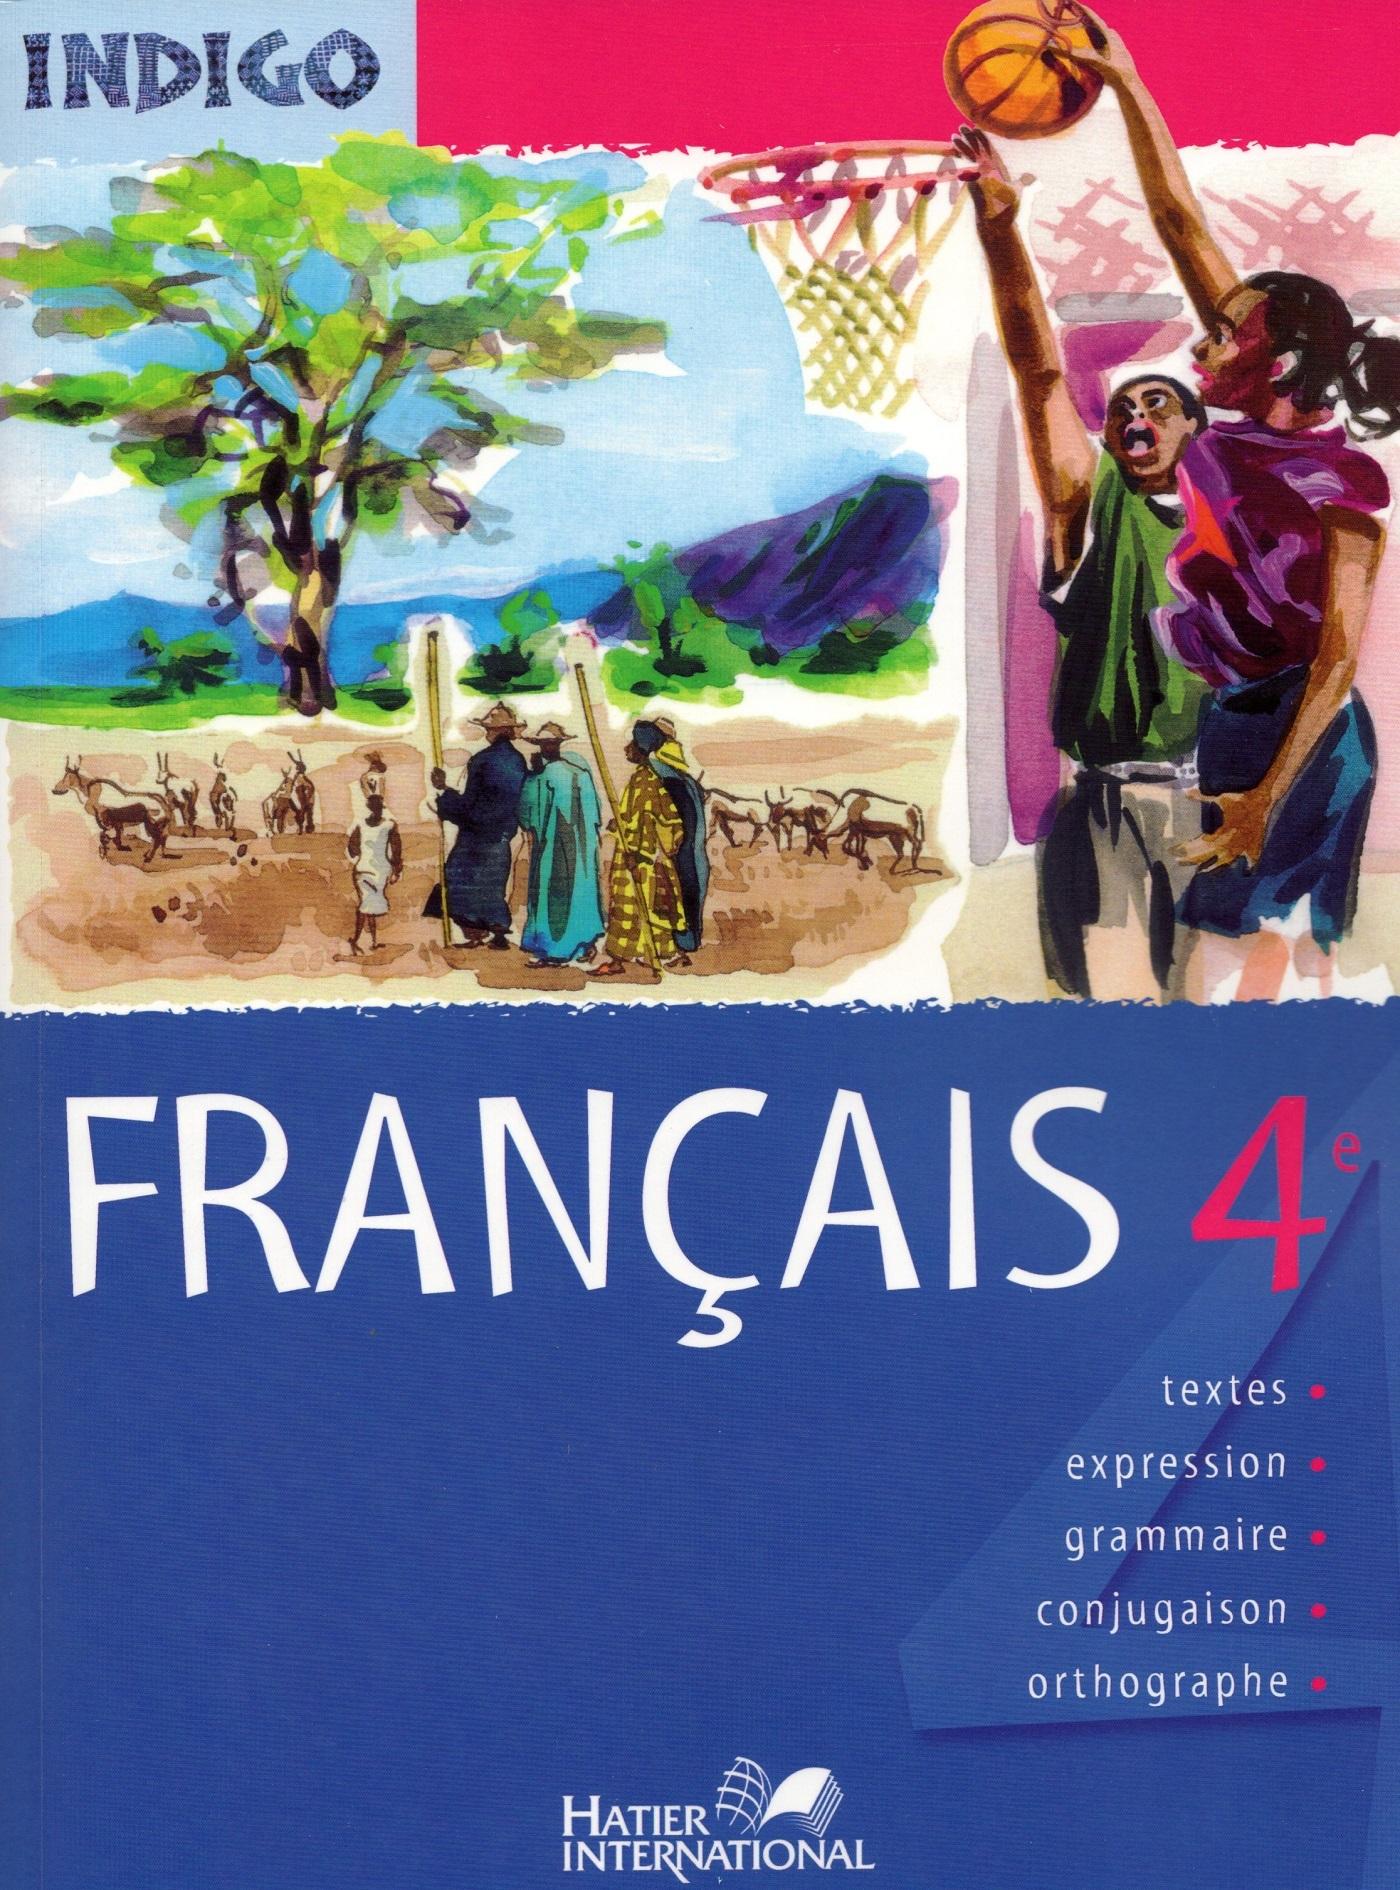 INDIGO - FRANCAIS 4E